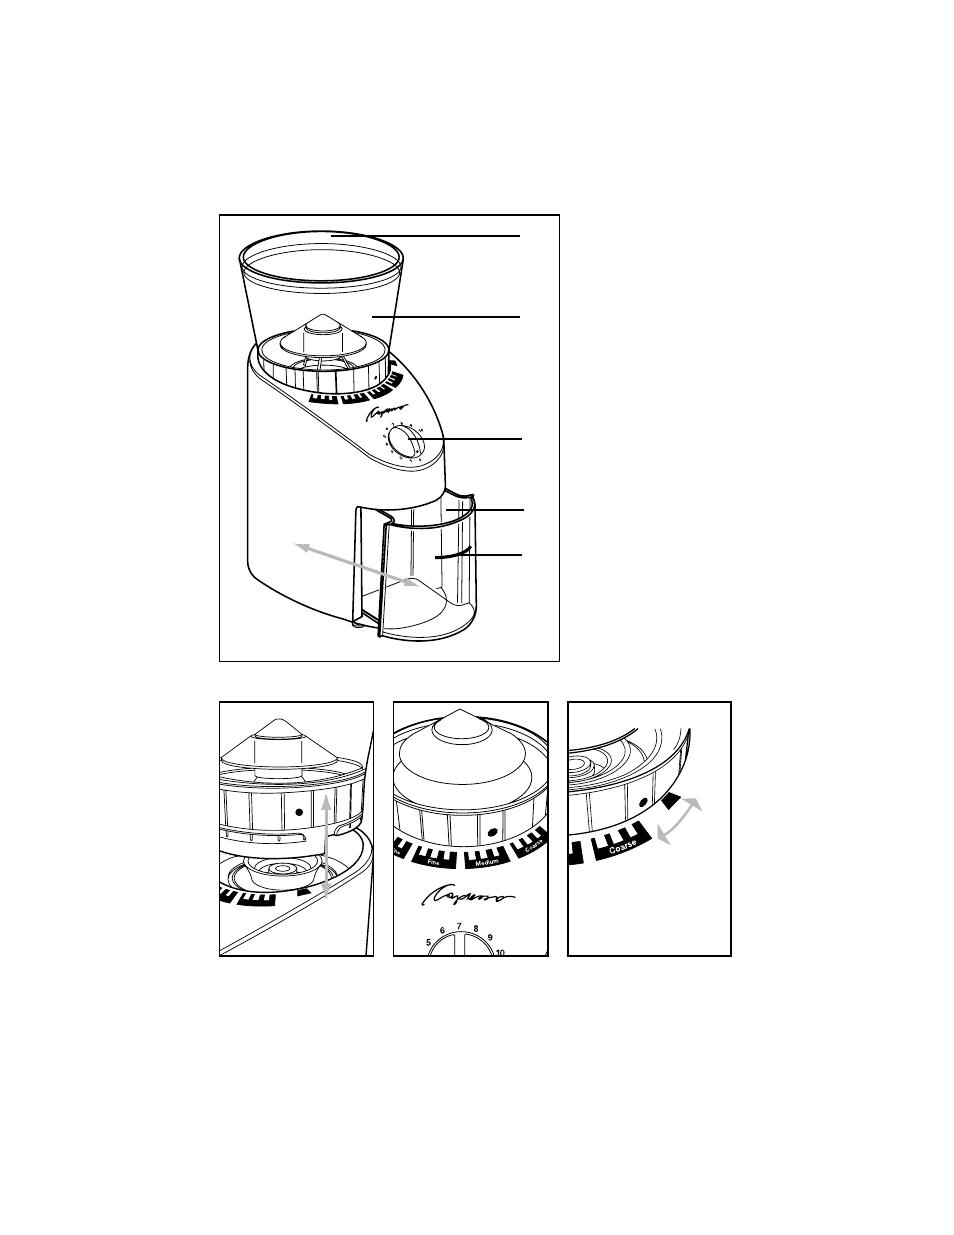 Capresso Infinity Burr Grinder Parts Diagram